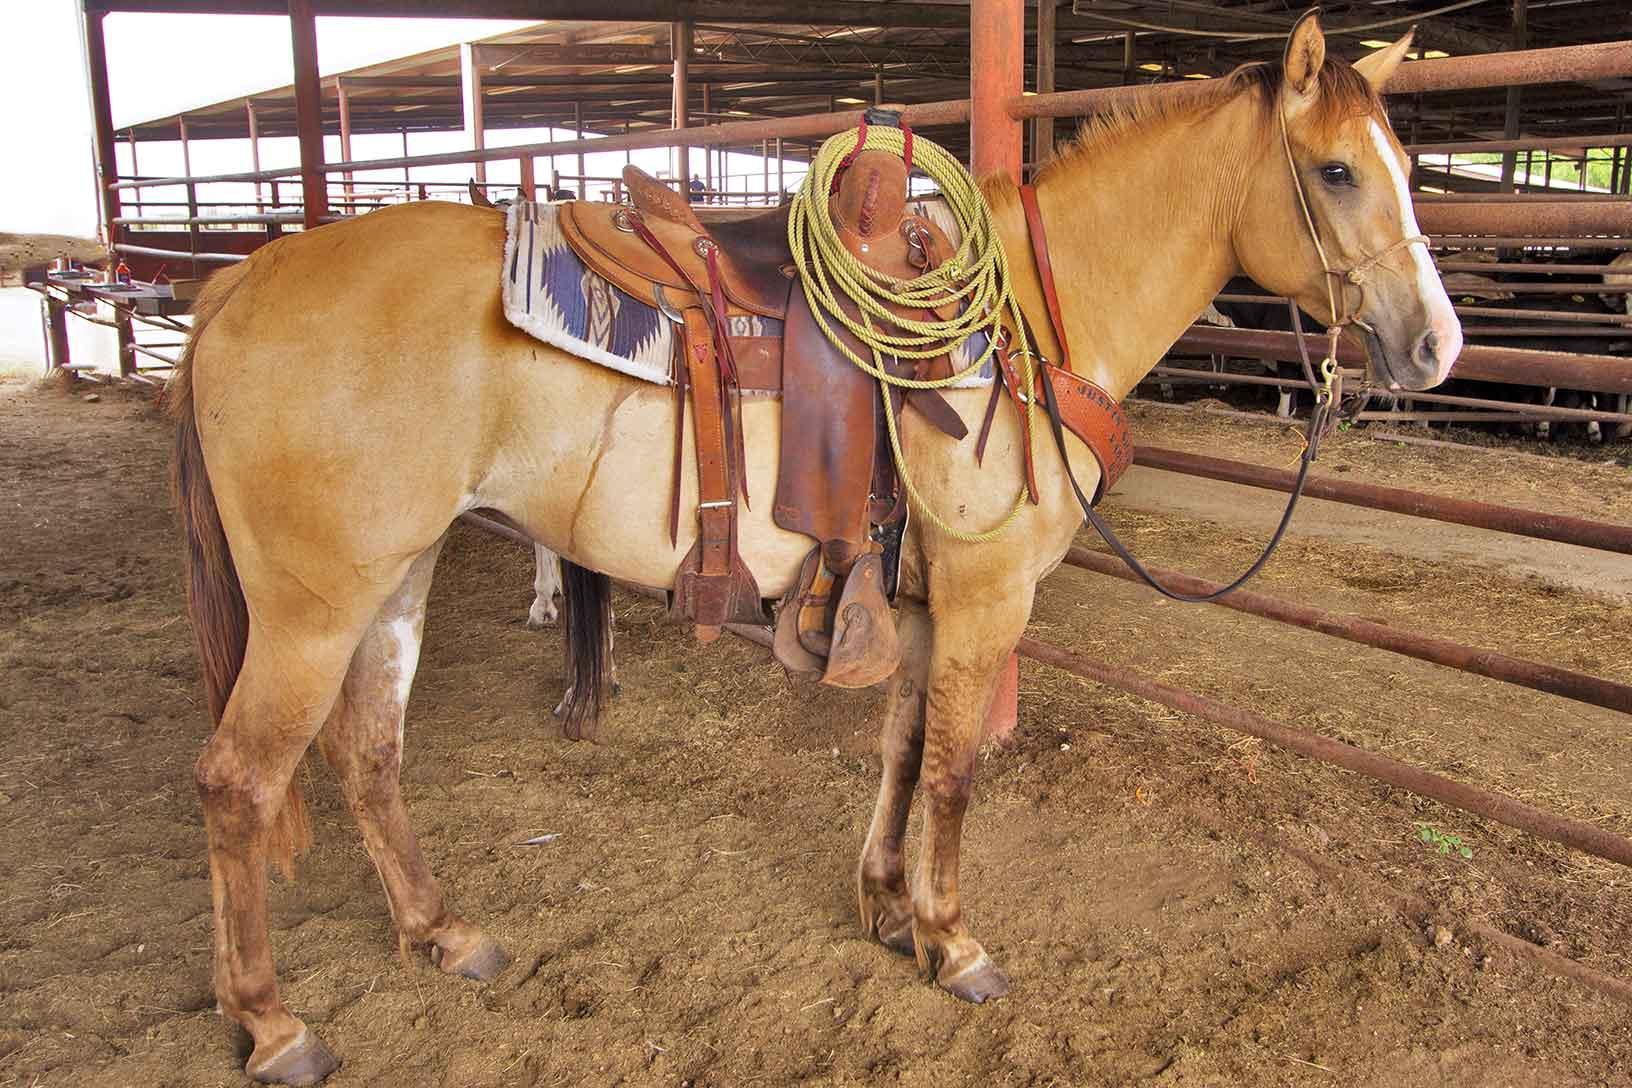 All saddled up